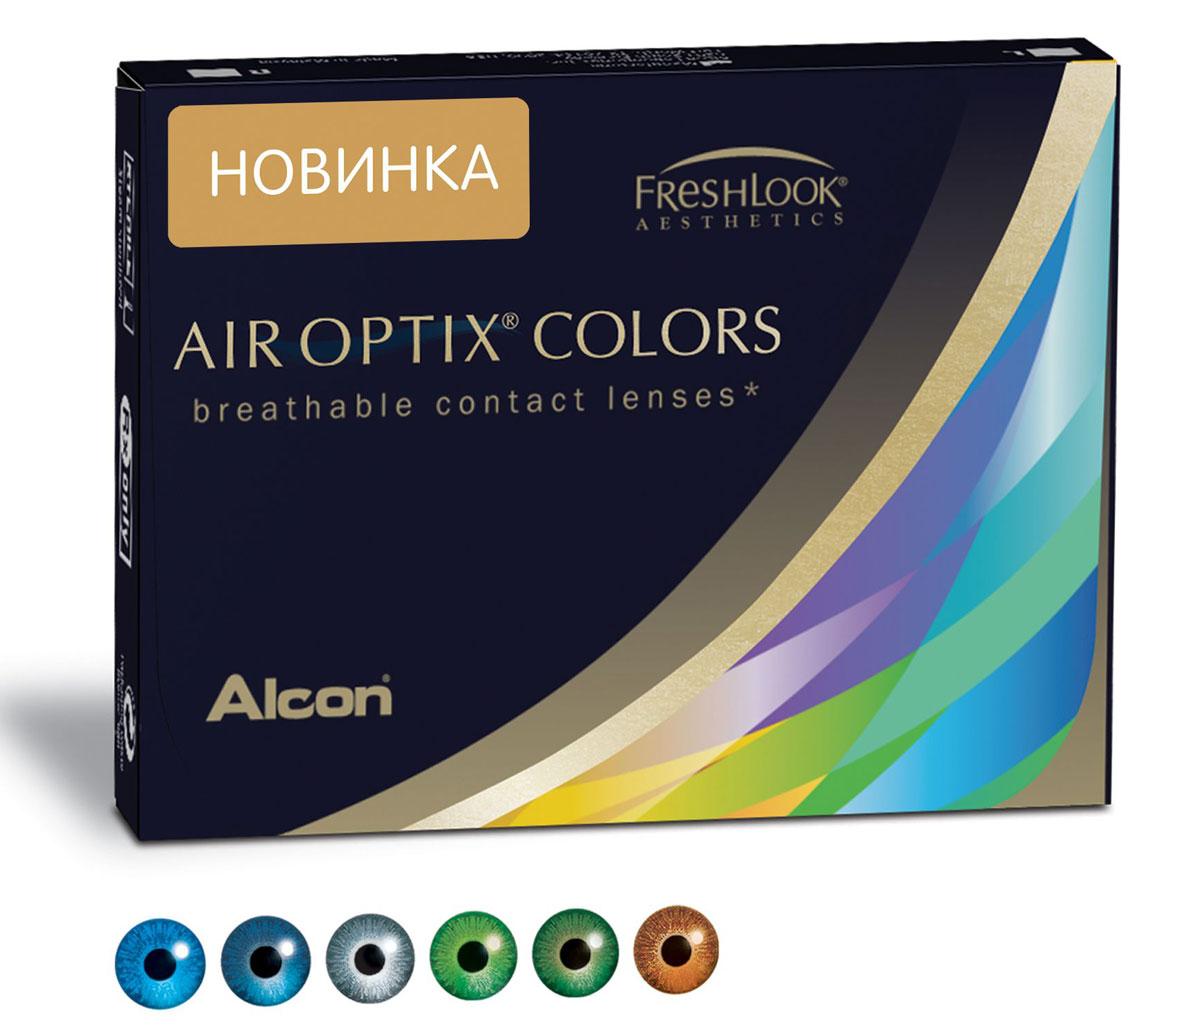 Аlcon контактные линзы Air Optix Colors 2 шт -2.50 Green